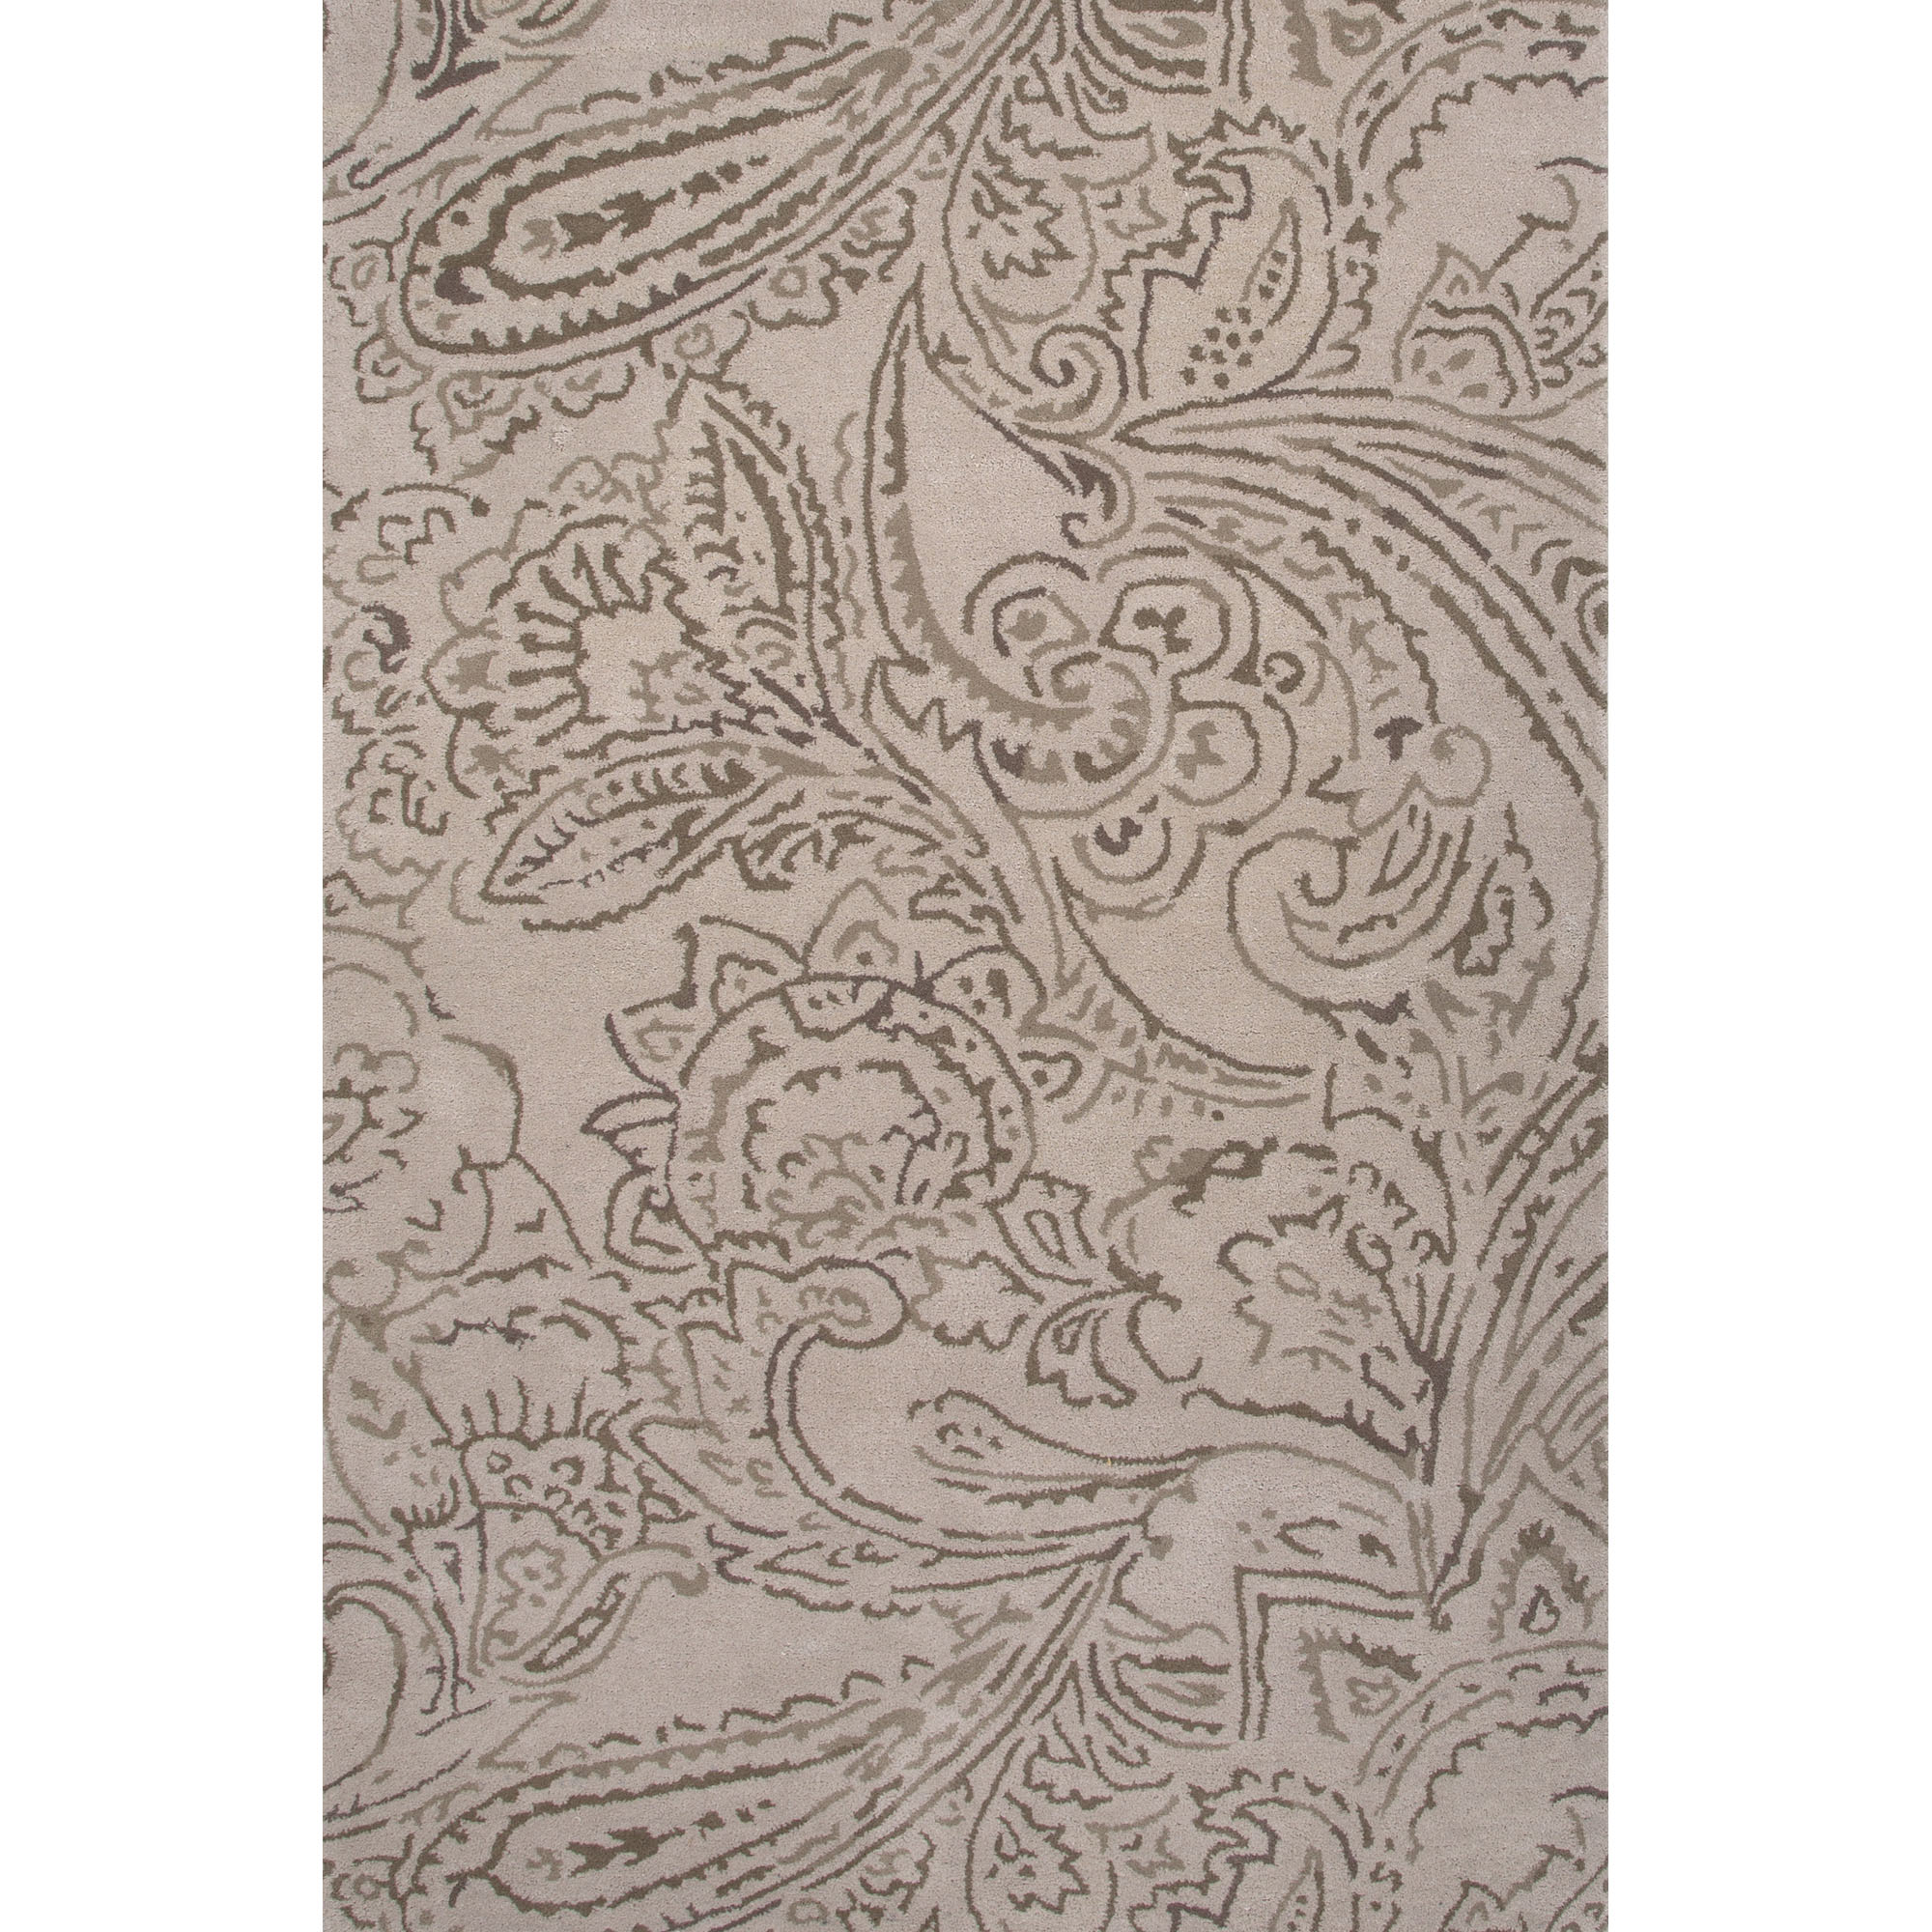 JAIPUR Rugs Timeless By Jennifer Adams Tufted 2 x 3 Rug - Item Number: RUG122156